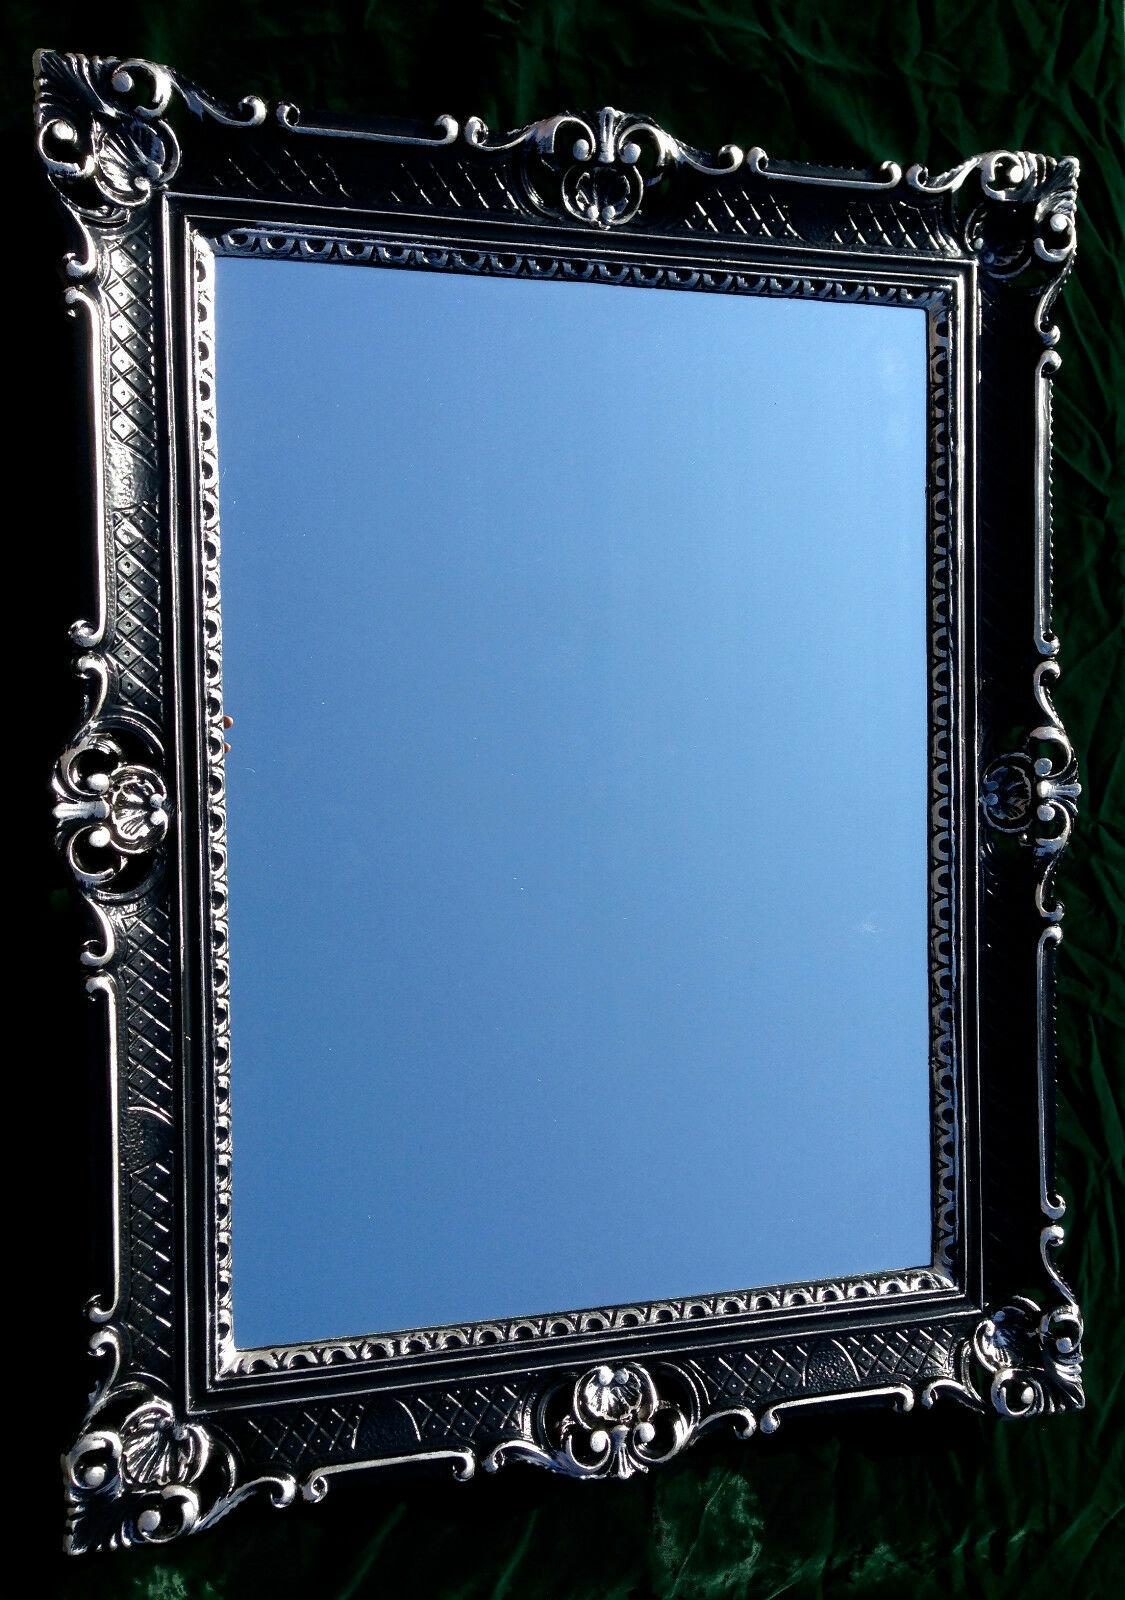 Mobiliar & Interieur Spiegel & Rahmen Wandspiegel Barock Rechteckig Spiegel Antik WANDDEKO Schwarz-Silber 90x70cm